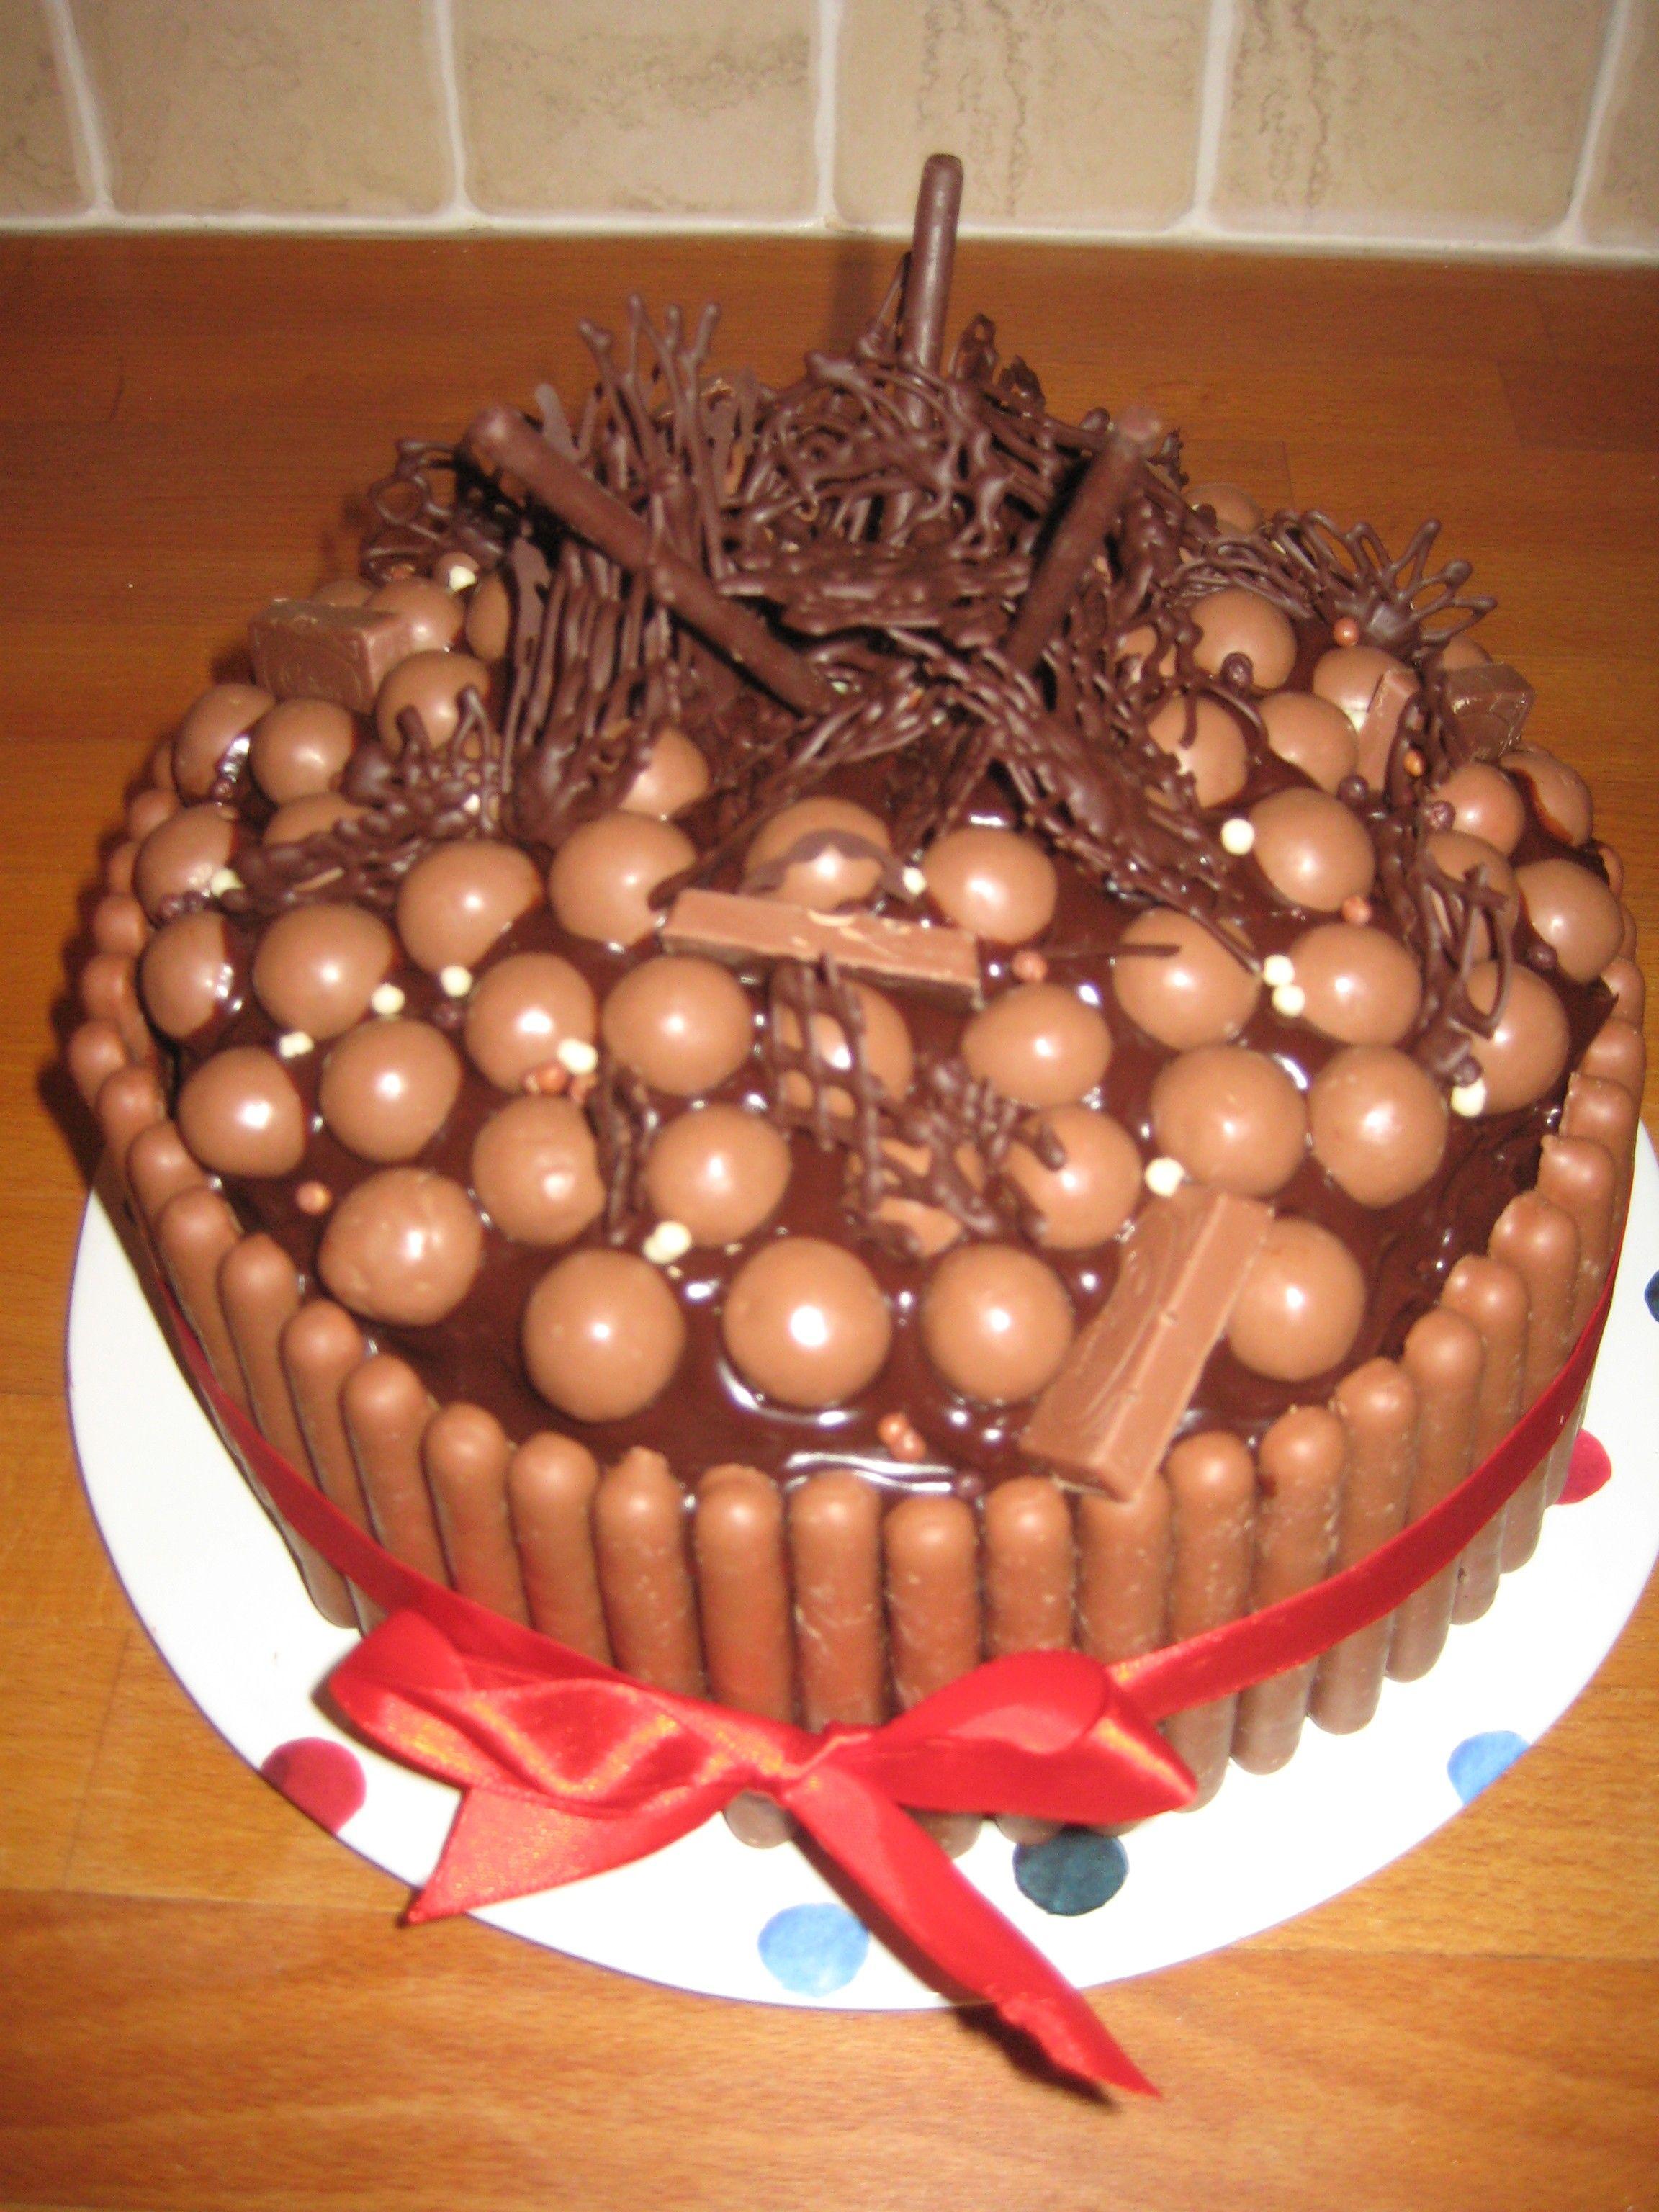 chocolates decorations ideas - Google Search | Easy cake ...